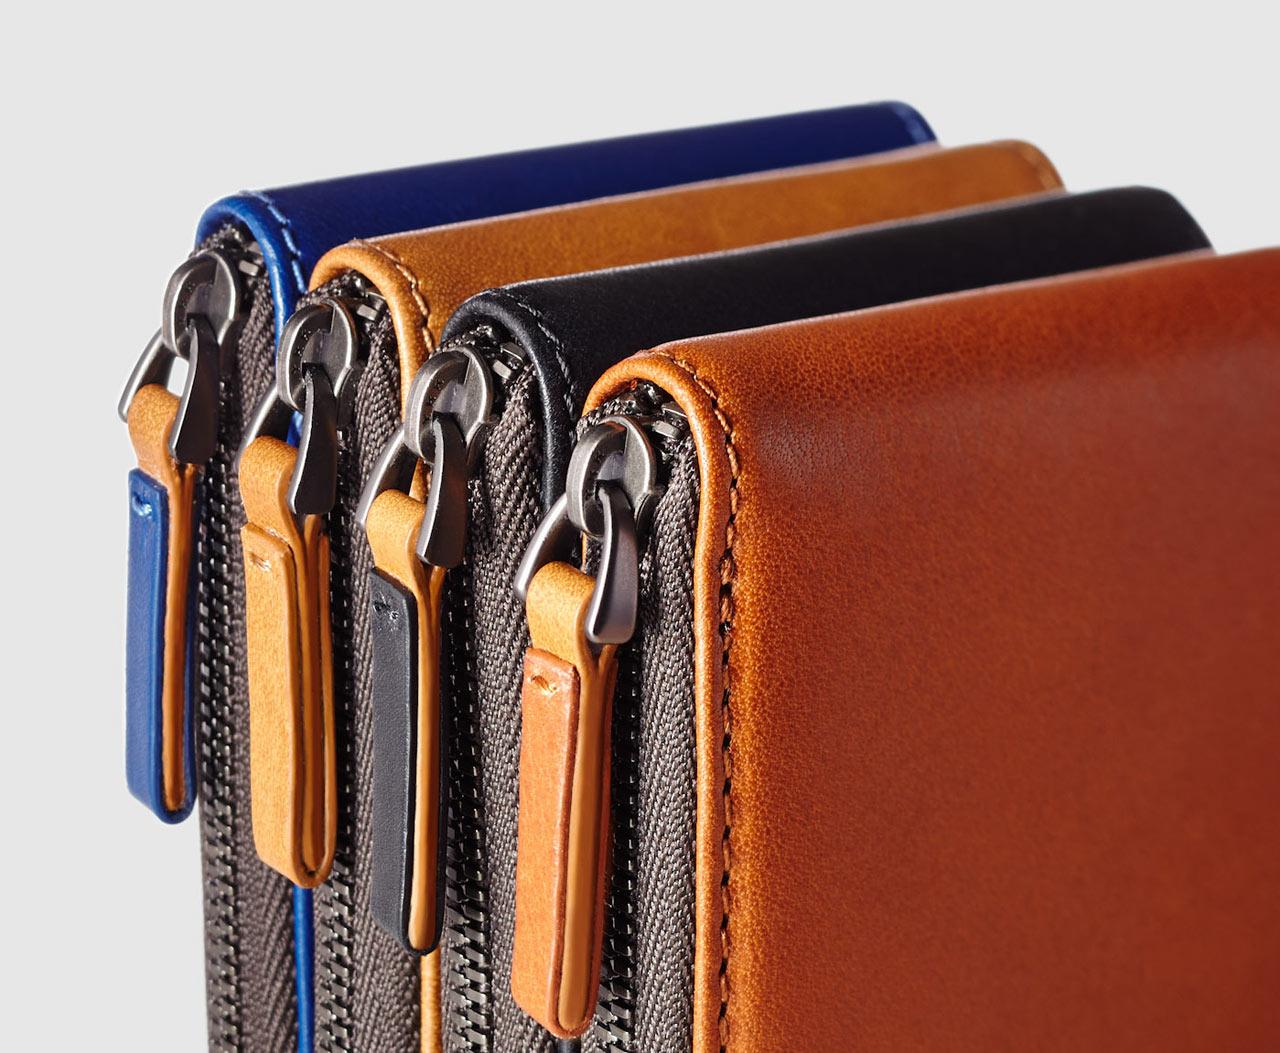 Octovo's Sleek Minimalist Leather Goods